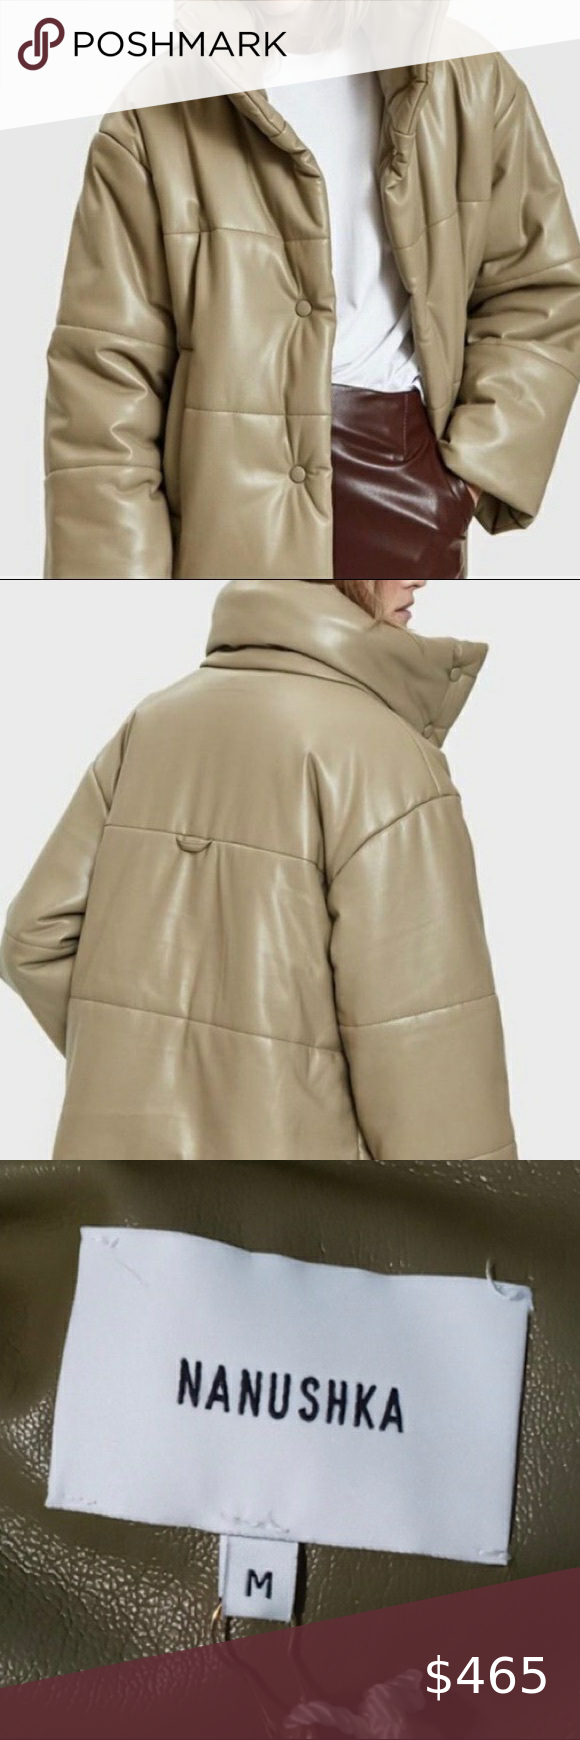 Nwt Nanushka Gide Vegan Leather Puffer Jacket Coat Nwt Nanushka Gide Vegan Leather Puffer Jacket Coat In Khaki But It L Leather Puffer Jacket Nanushka Jackets [ 1740 x 580 Pixel ]